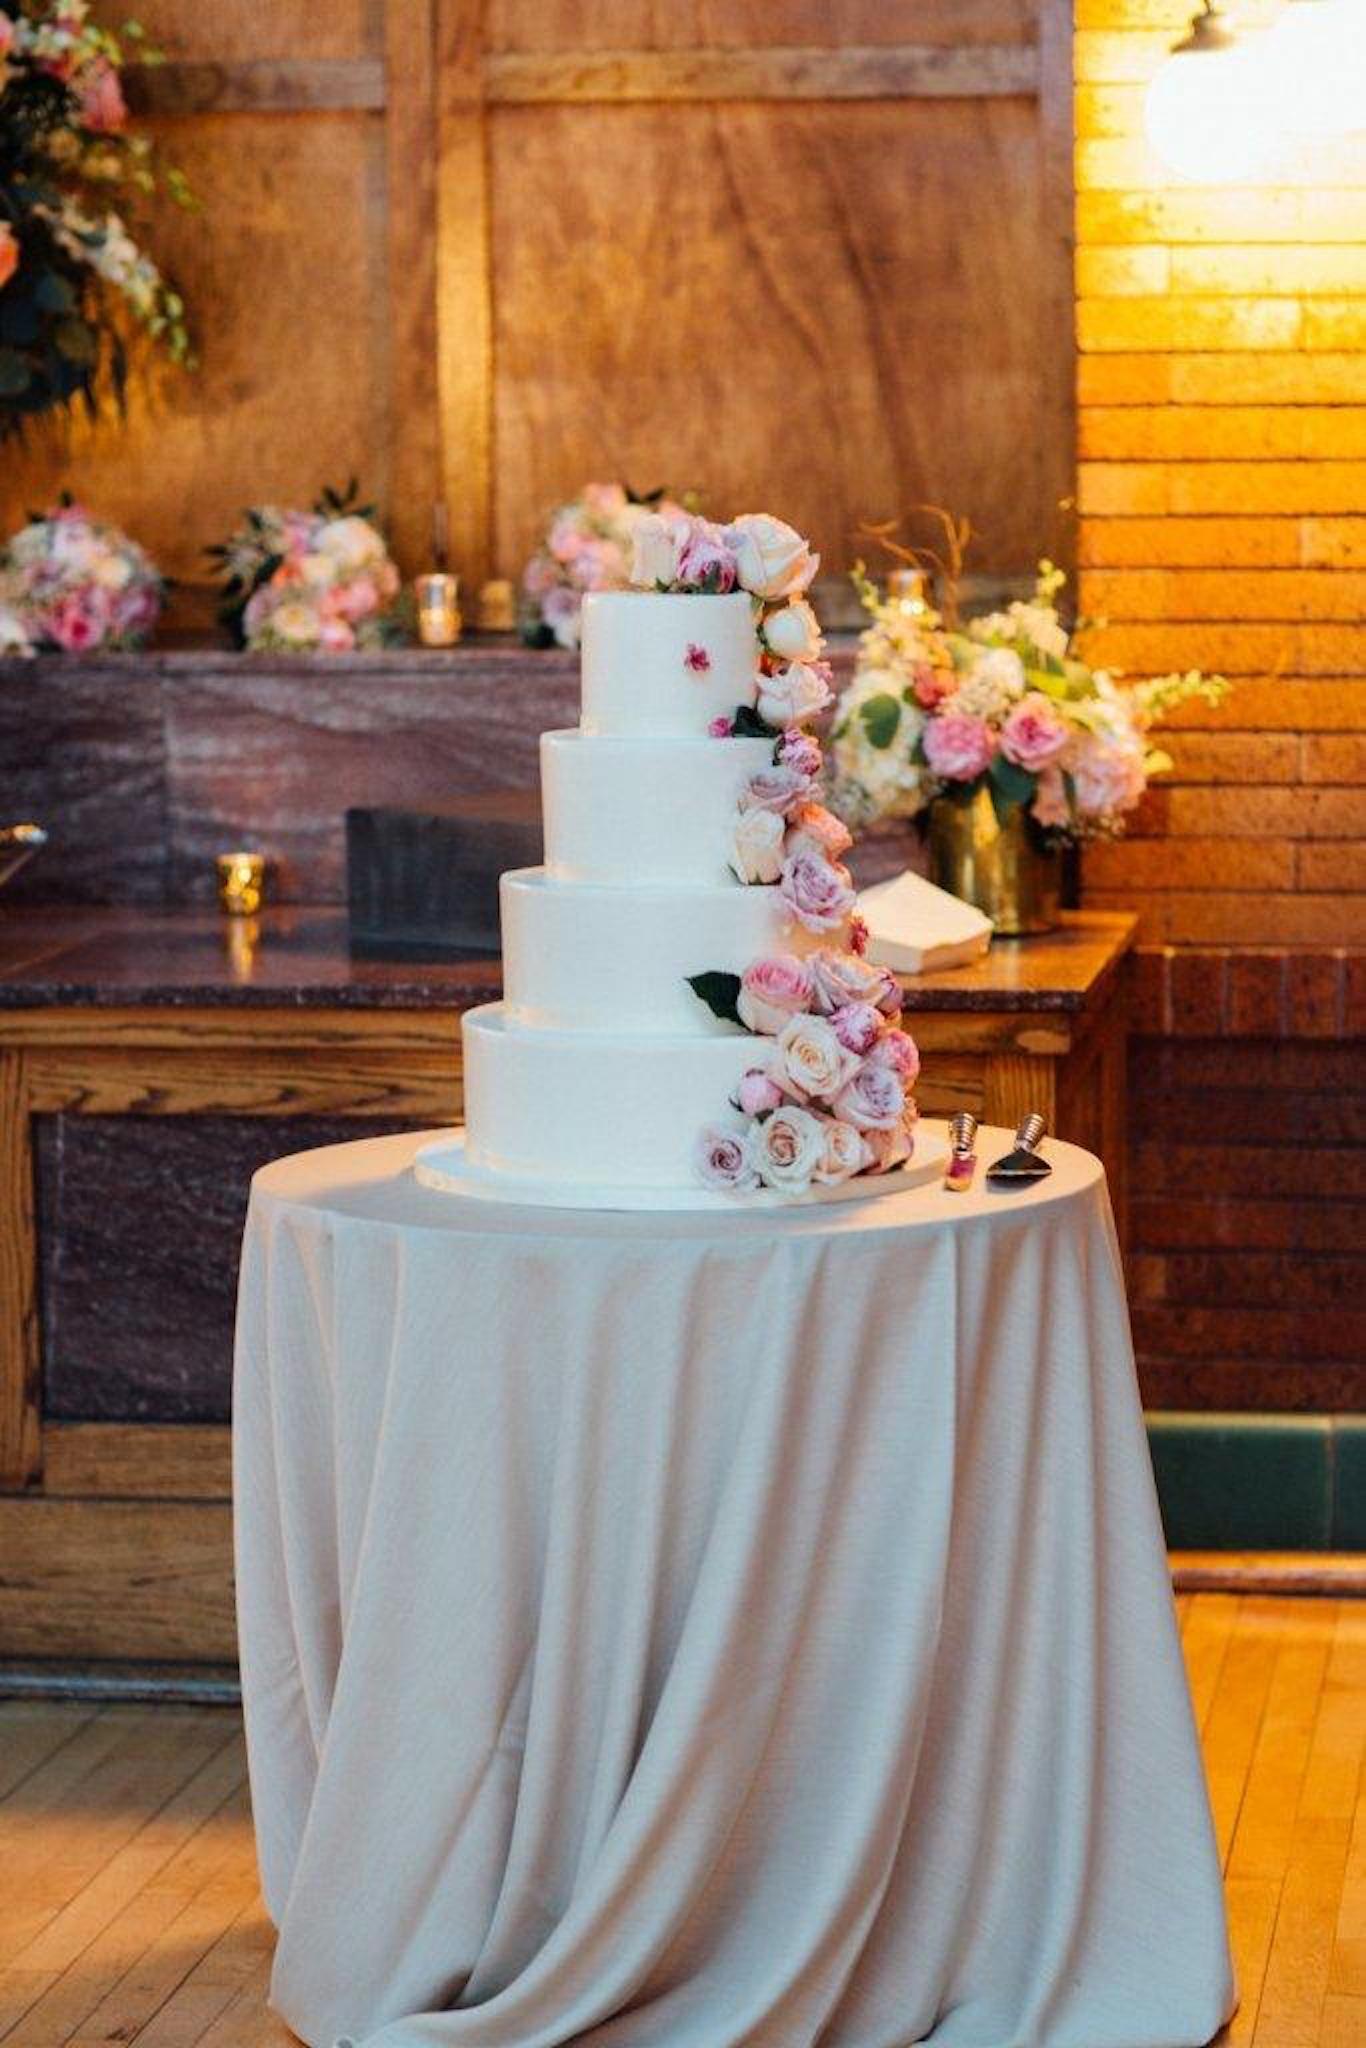 Flower wedding cake idea